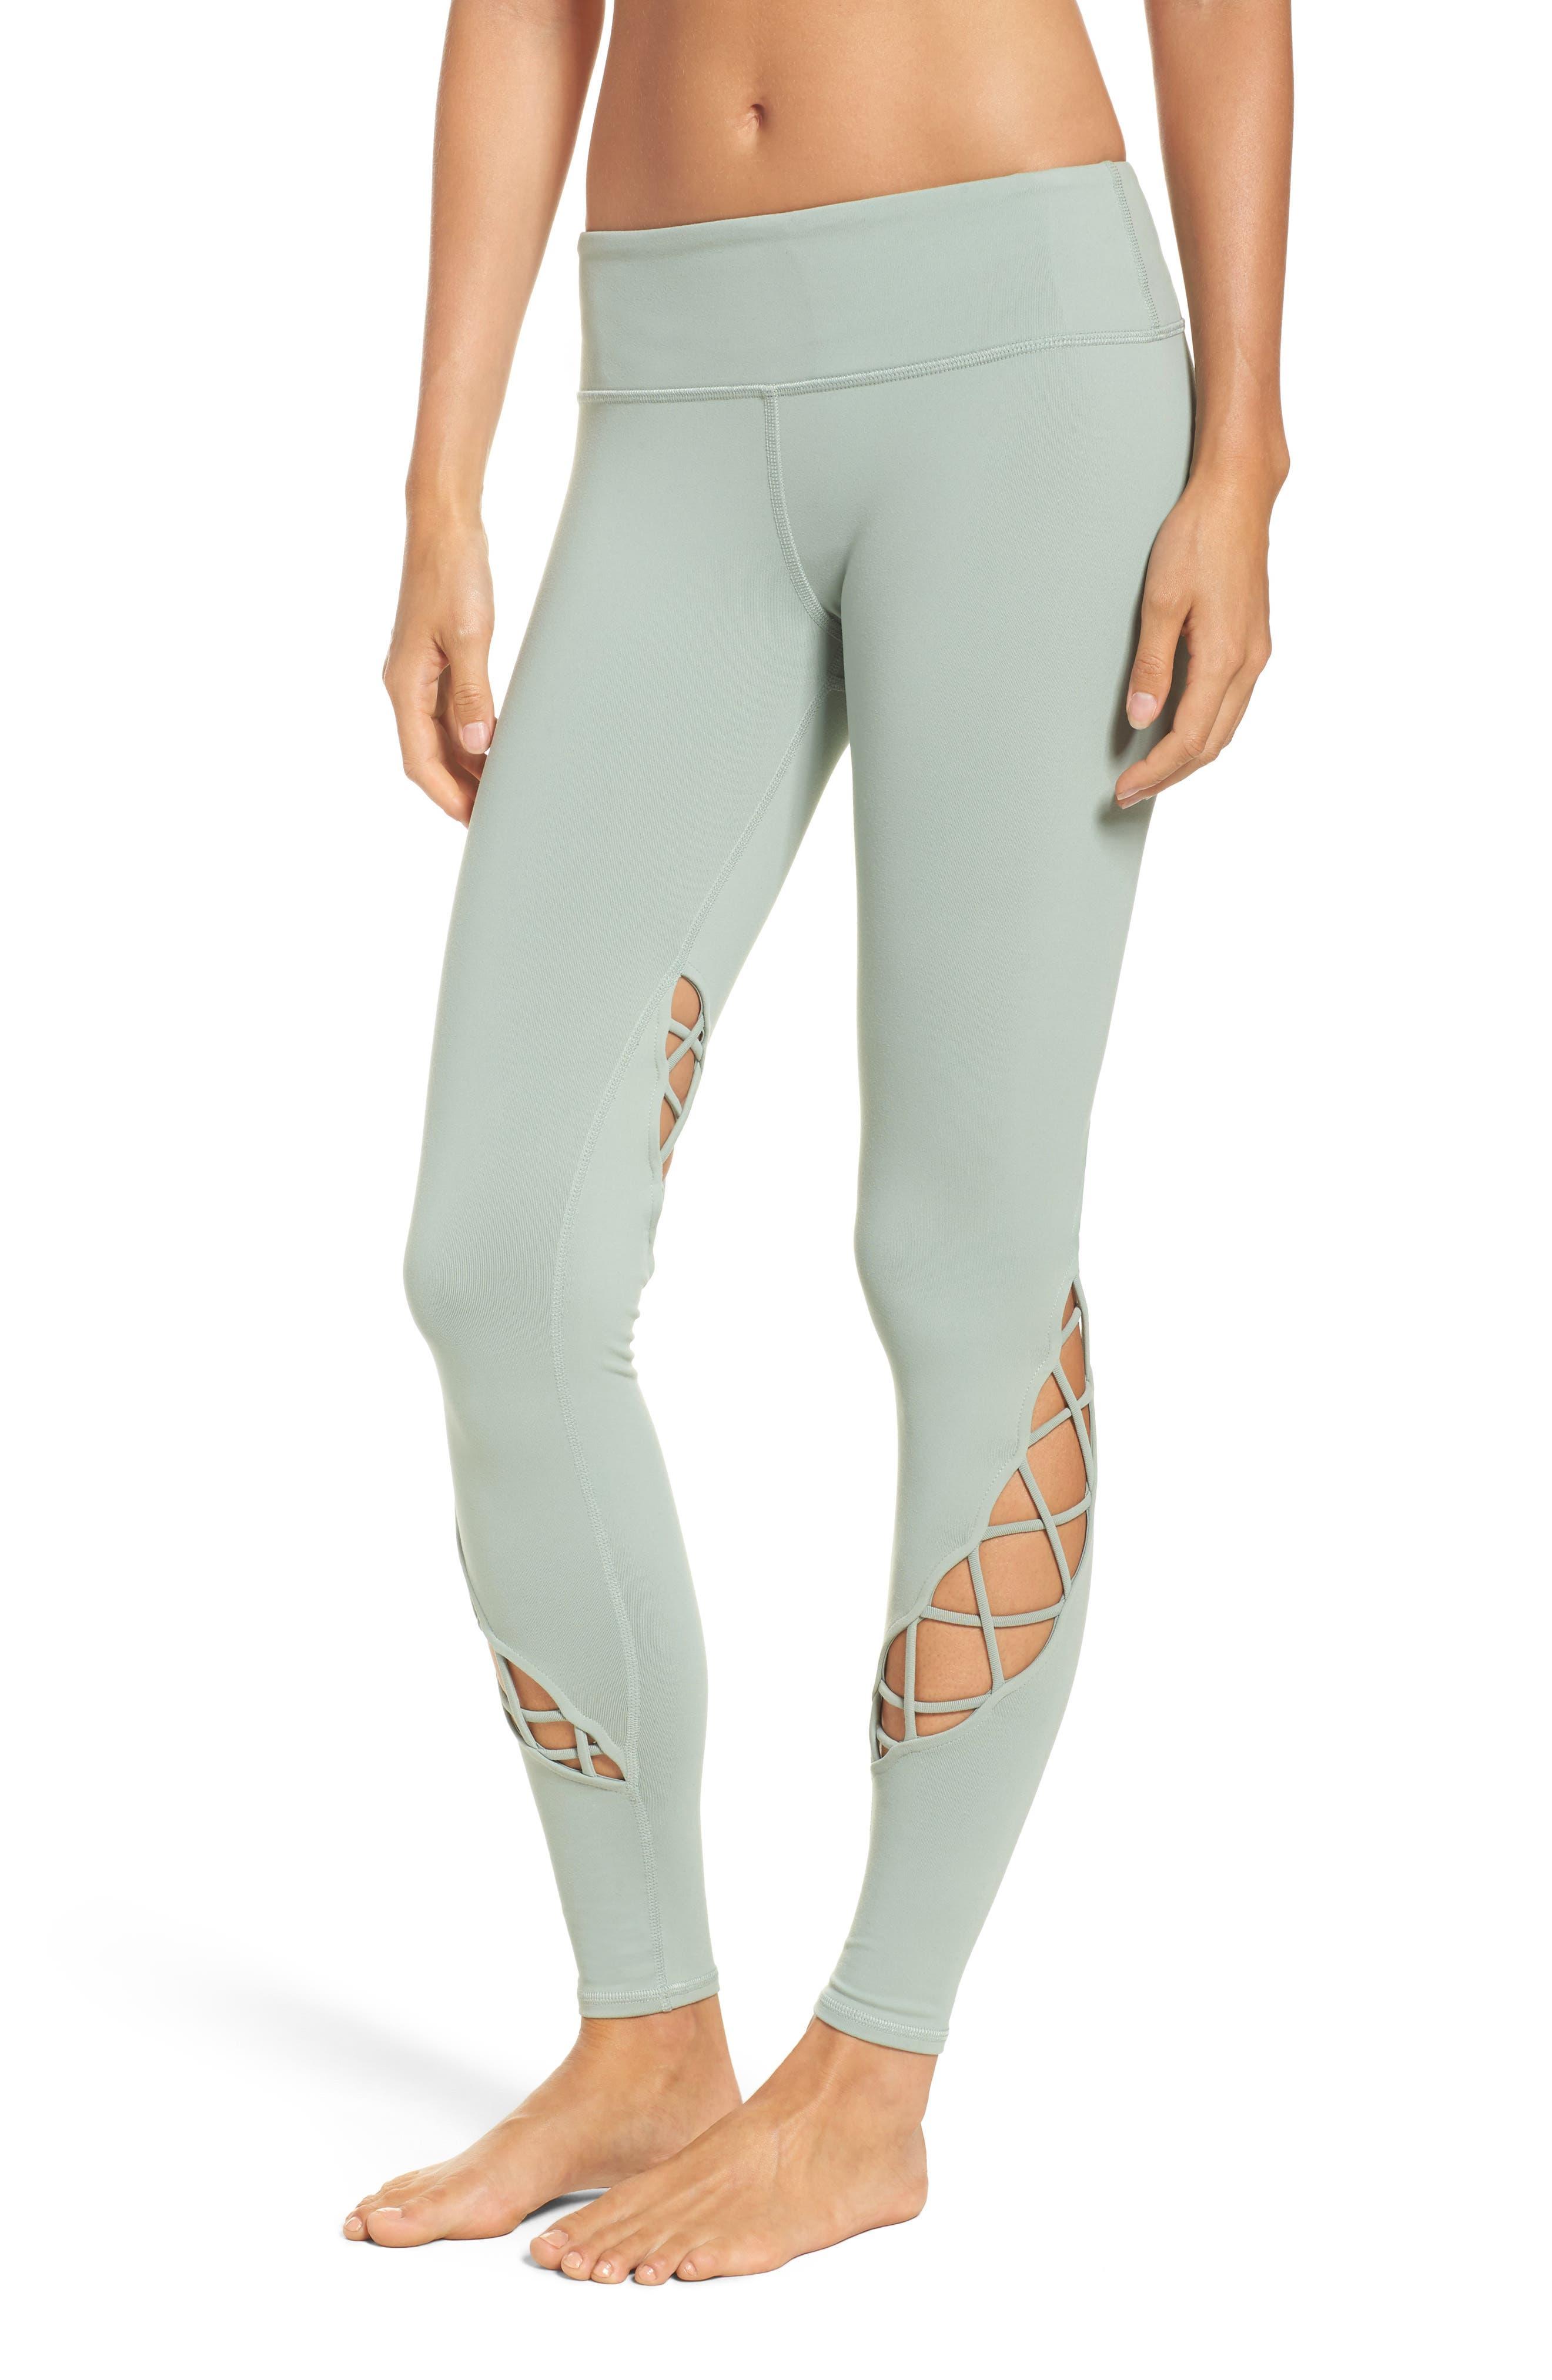 Entwine Yoga Leggings,                         Main,                         color, Sage